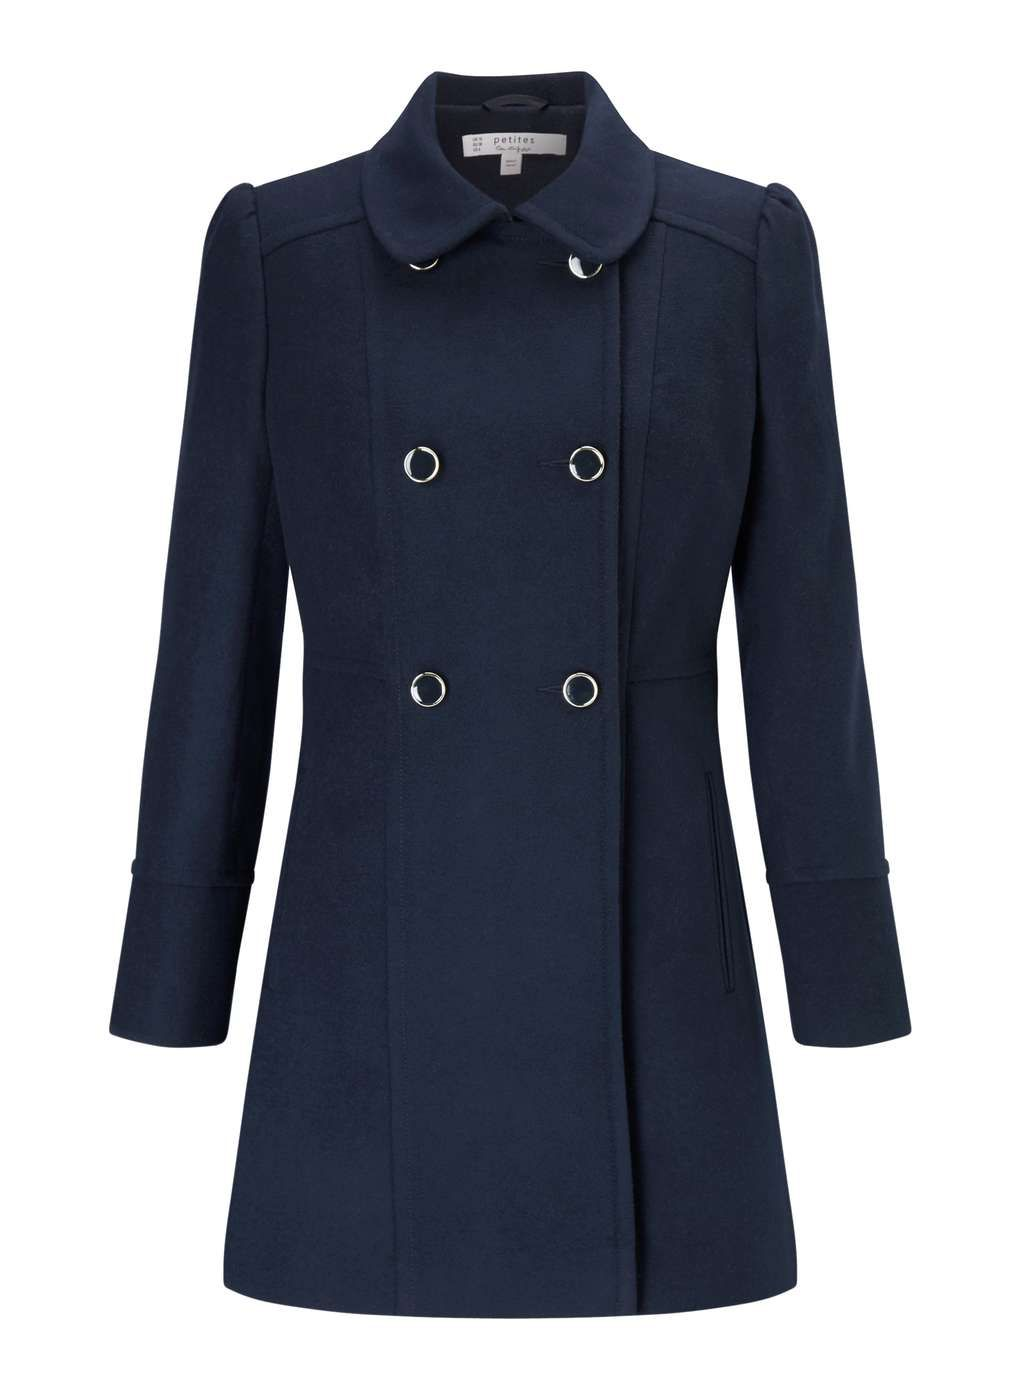 PETITE Navy Pea Coat - View All - Clothing - Miss Selfridge ...